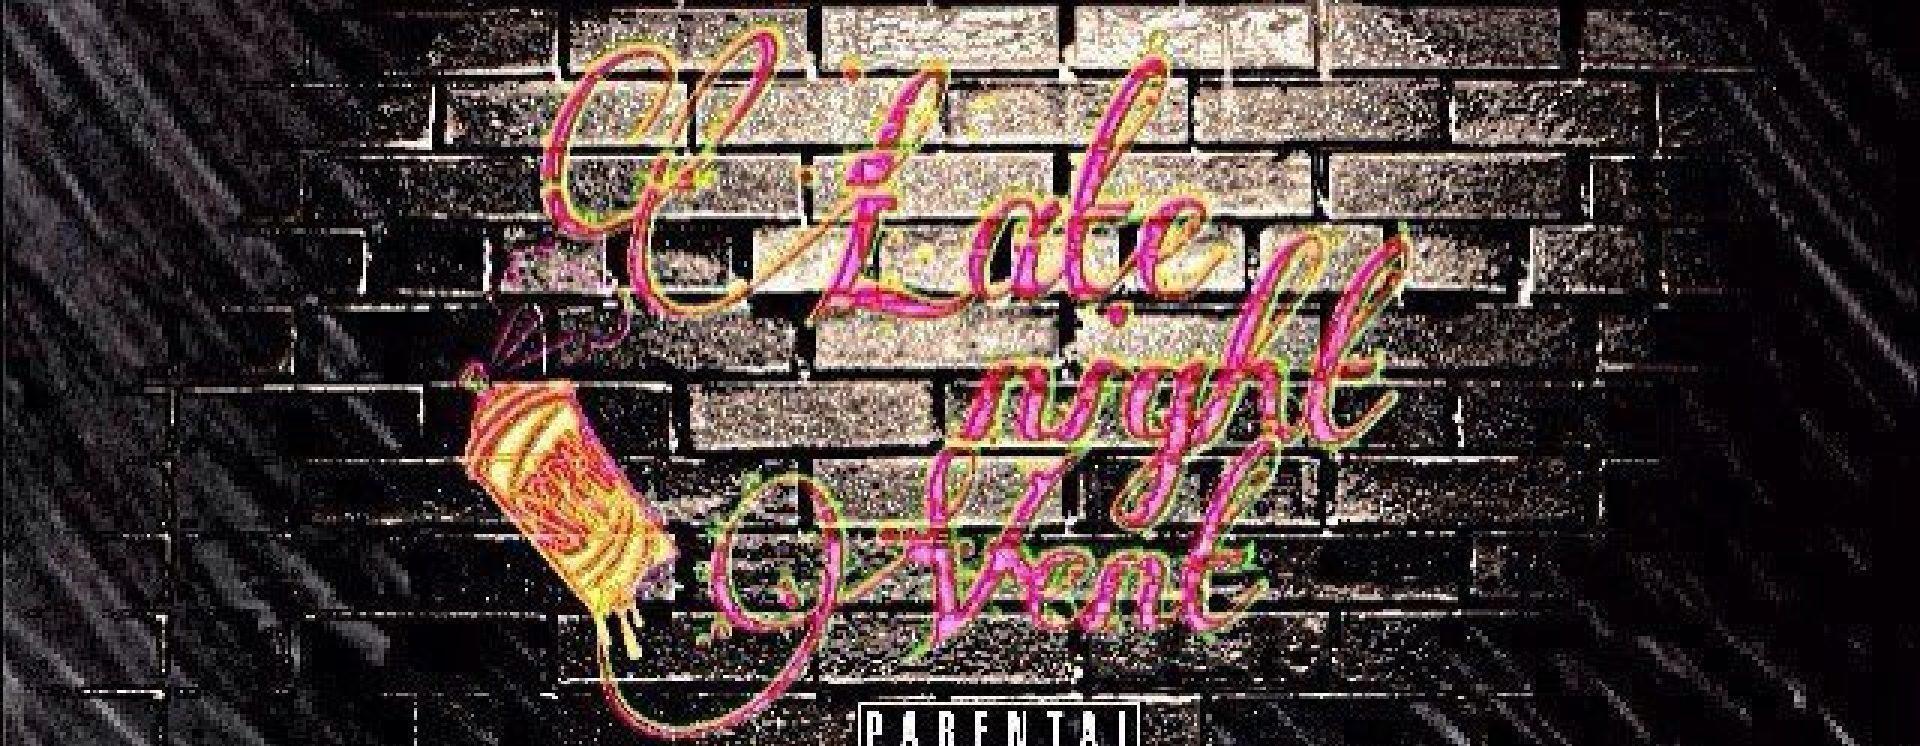 1439481417 kidd dip new single late night vent copy